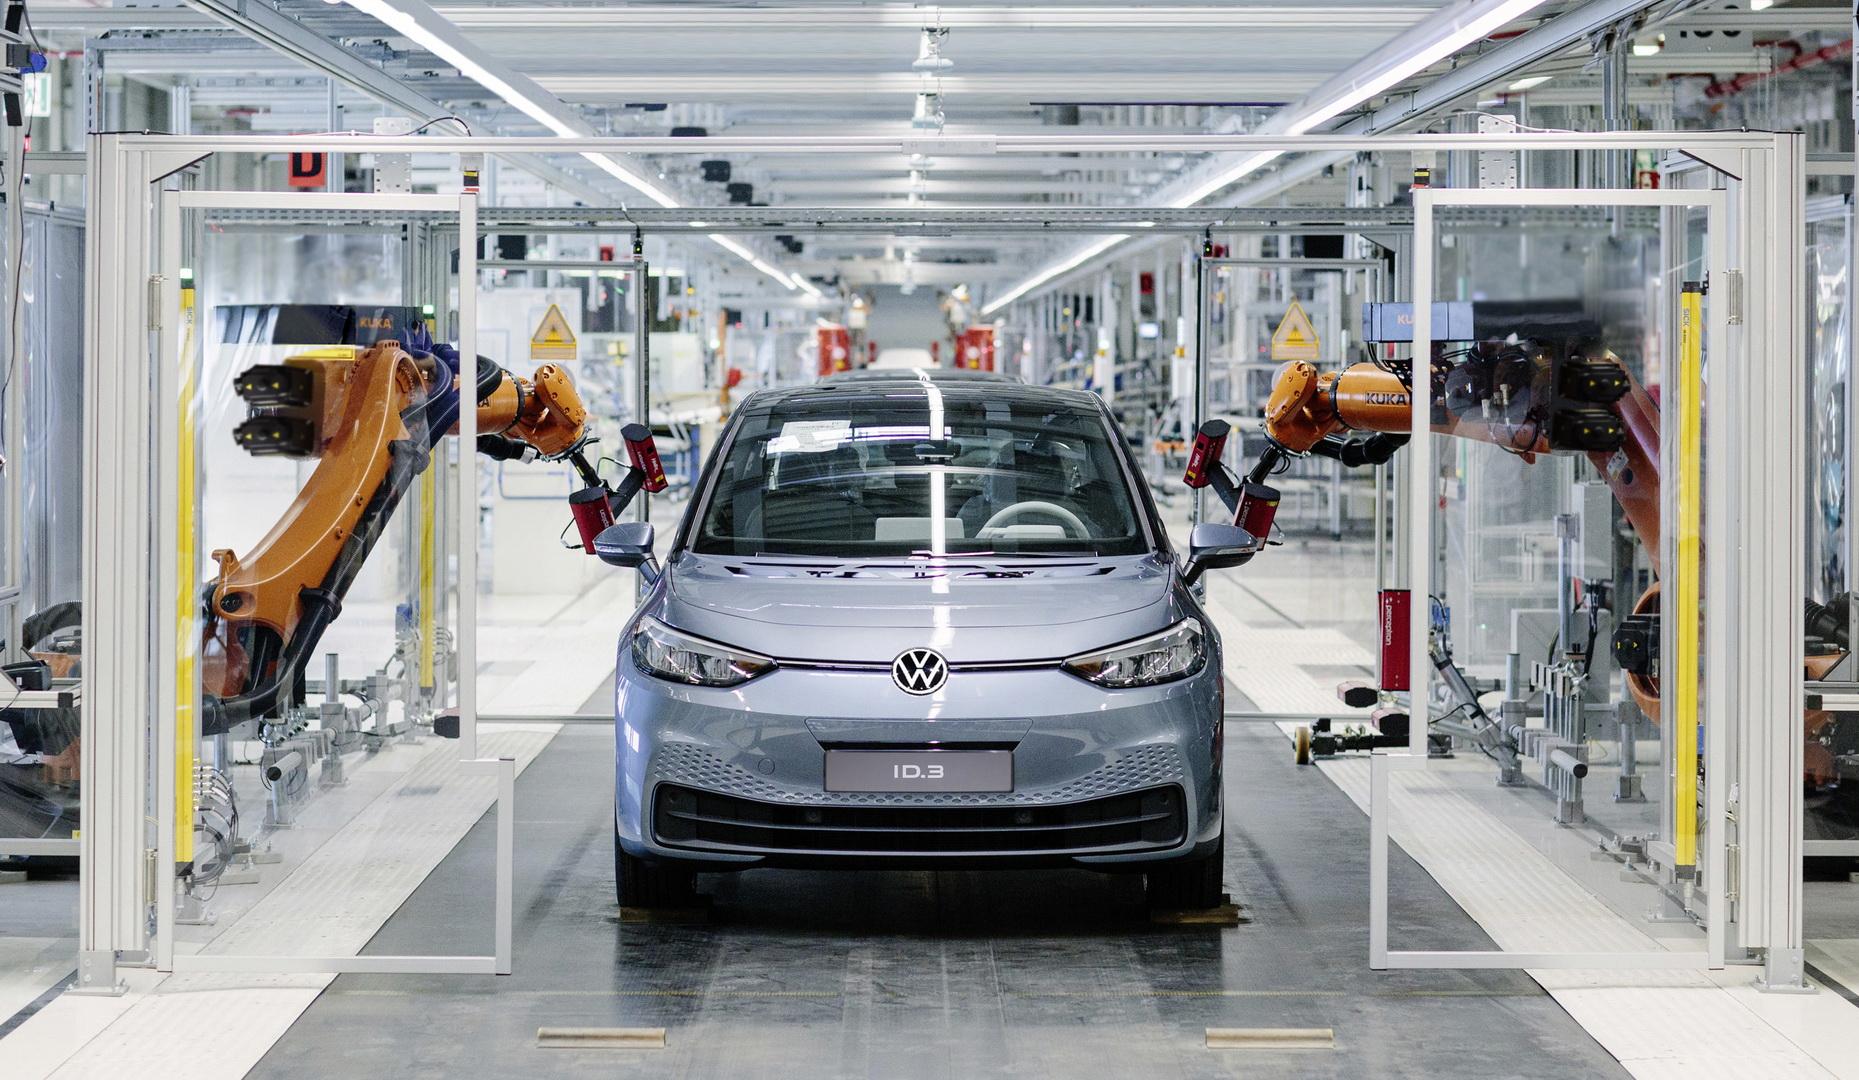 https://www.carscoops.com/wp-content/uploads/2019/11/62d16d3b-vw-id3-zwickau-plant-1.jpg